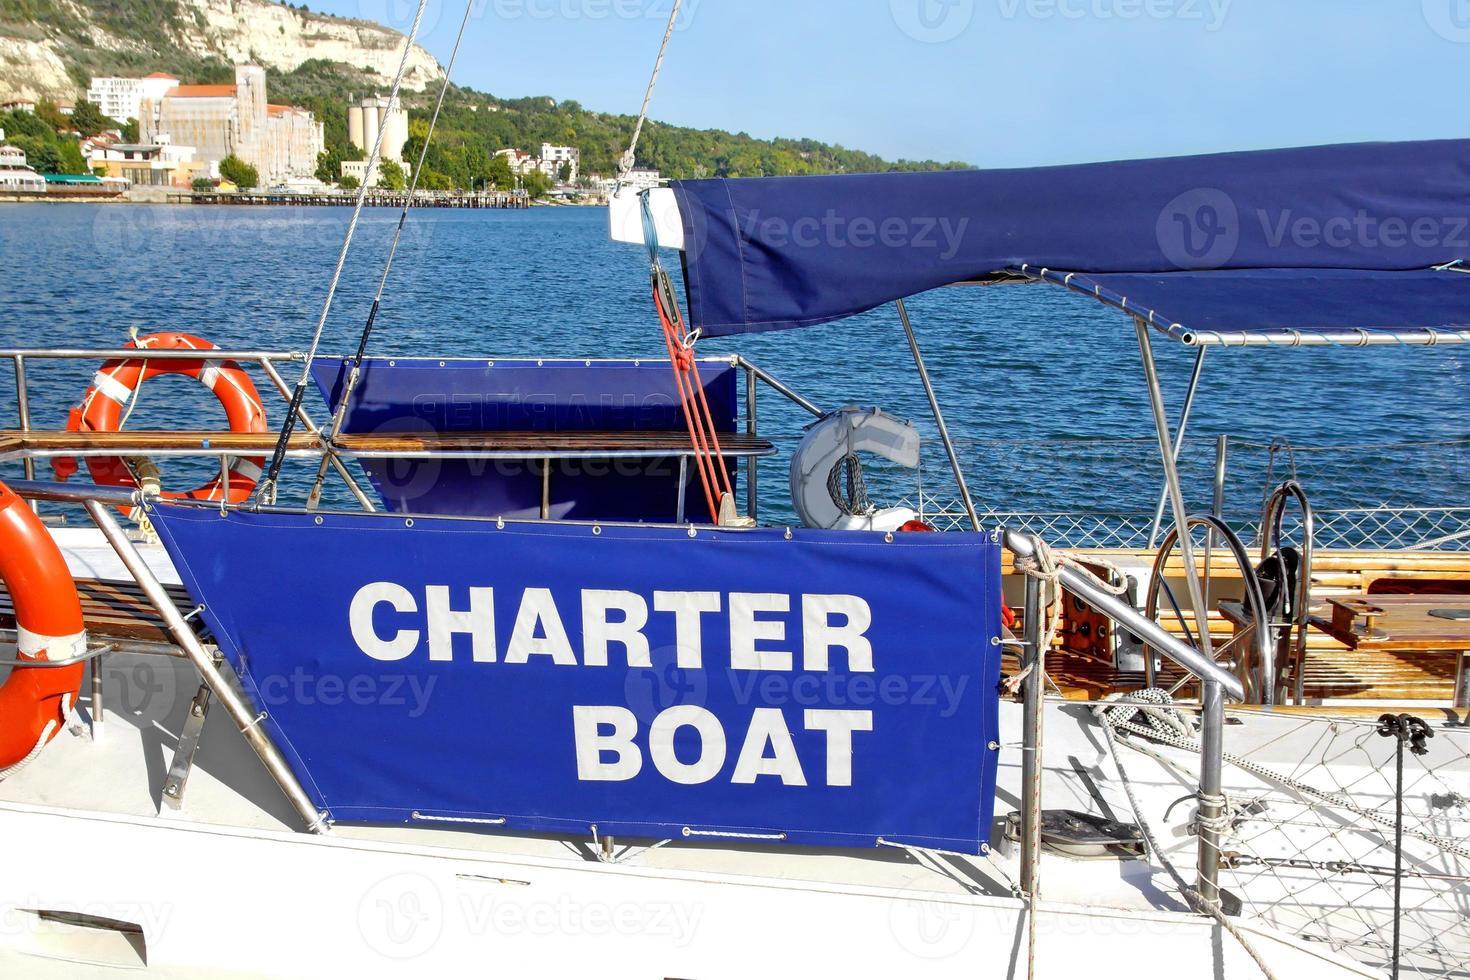 hyra charterbåt vid havsbryggan foto